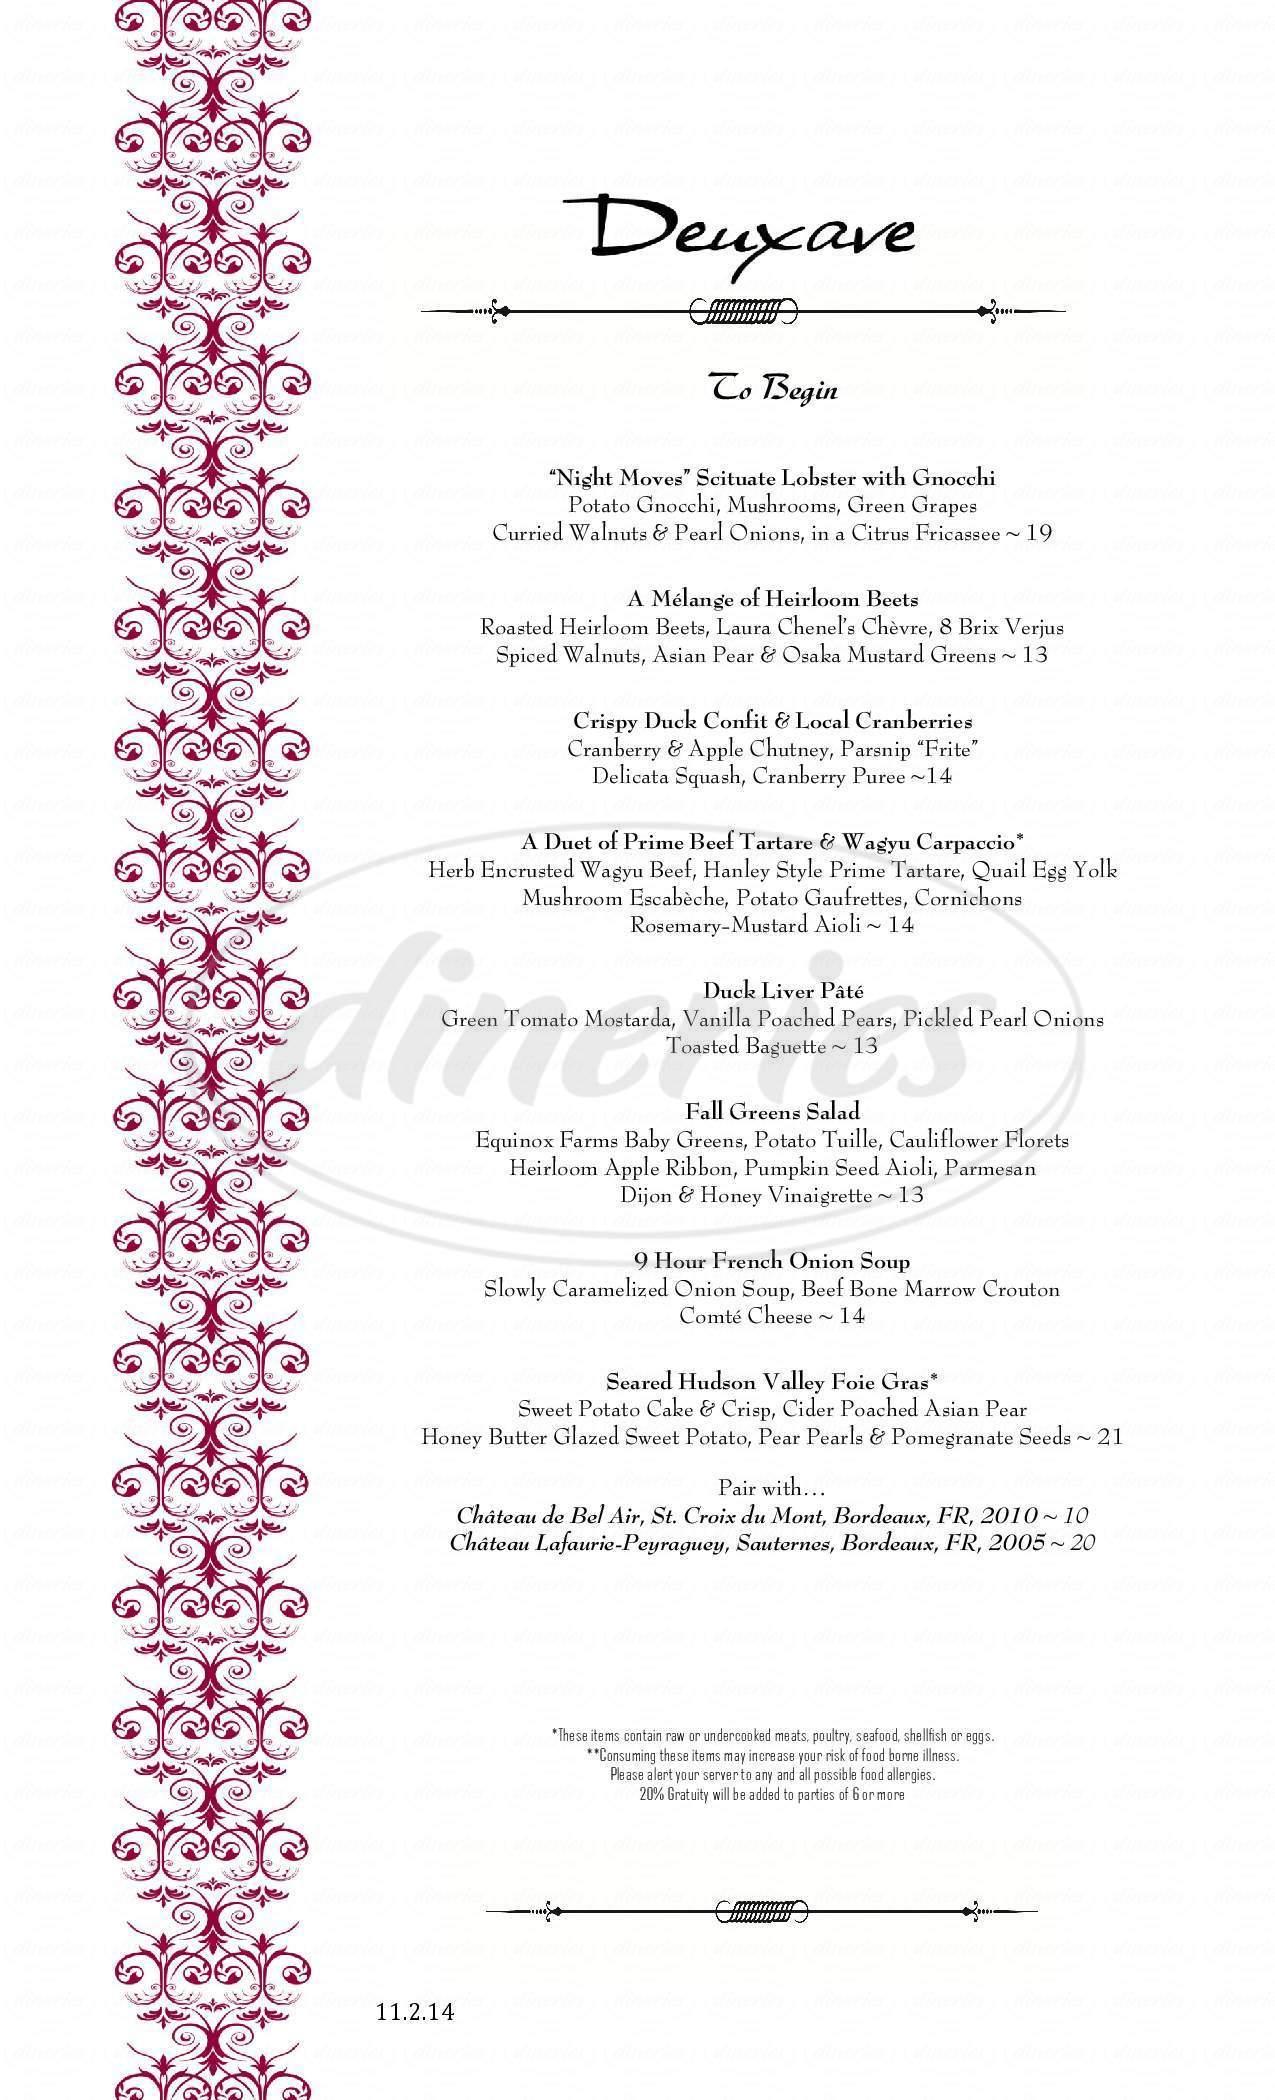 menu for Deuxave